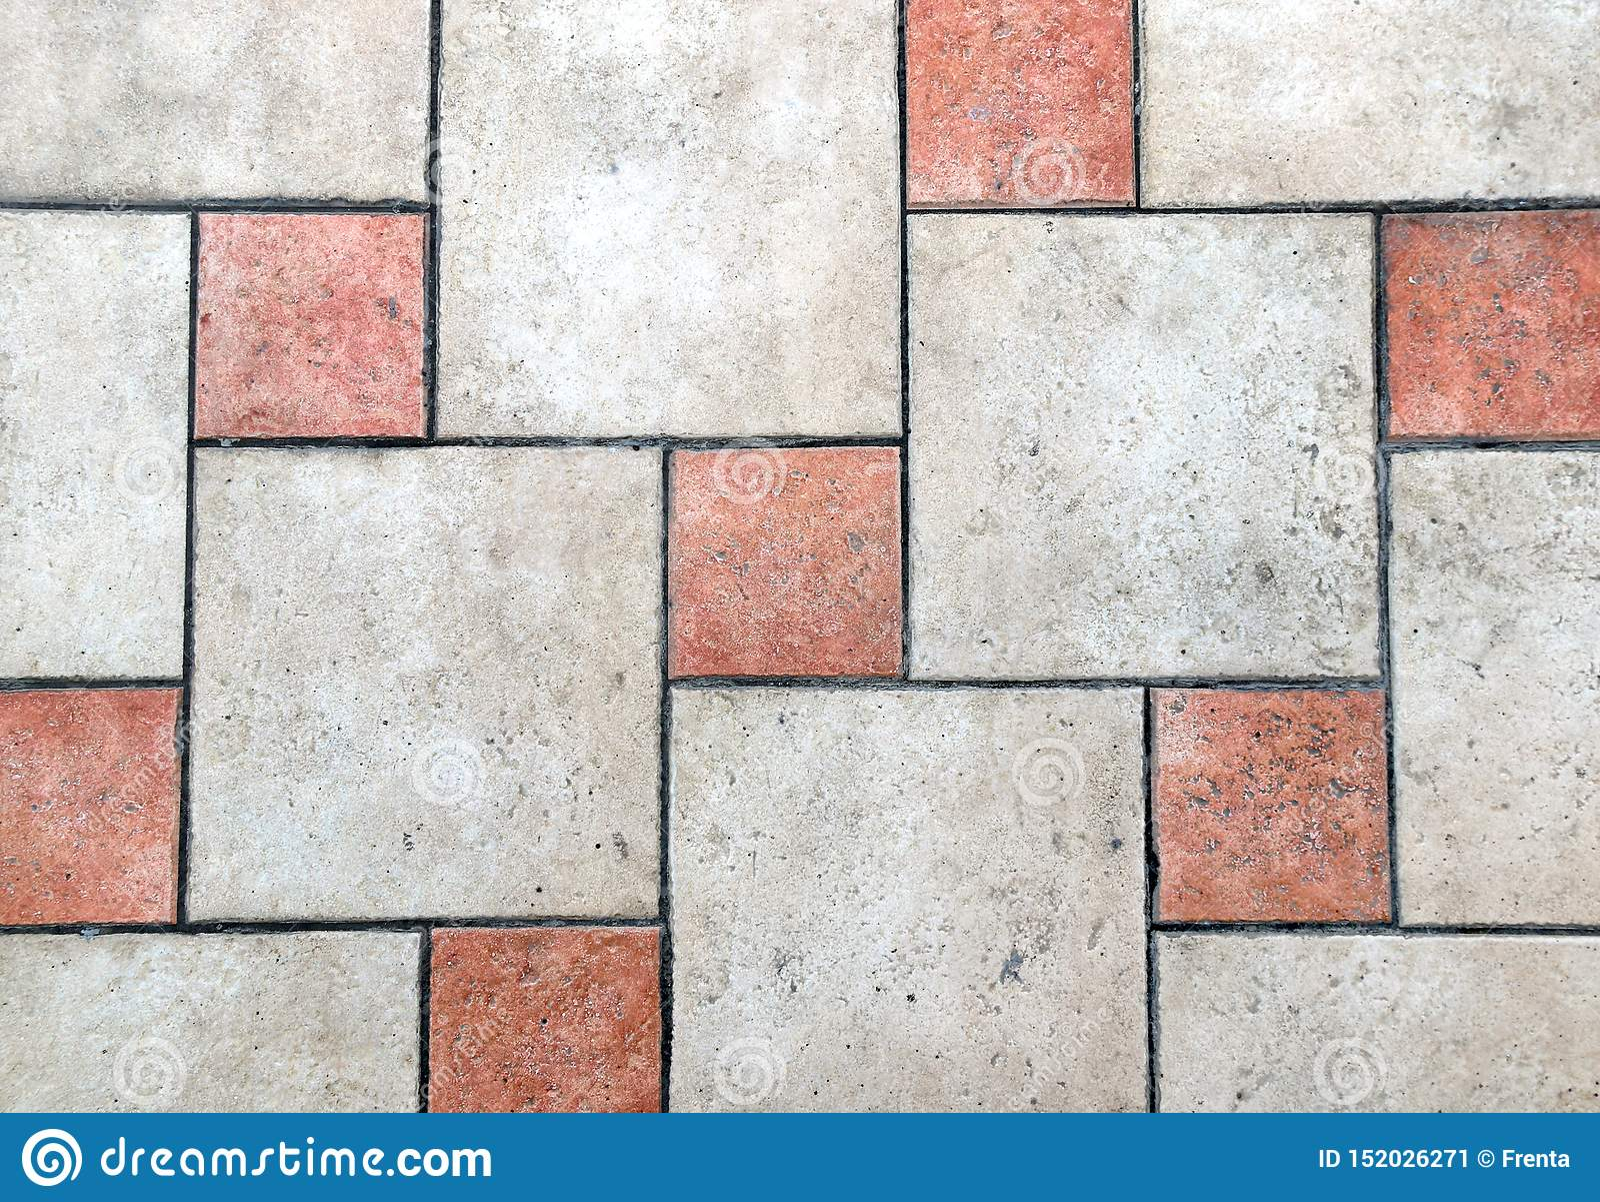 https www dreamstime com porcelain tiles floor texture old red beige colors image152026271